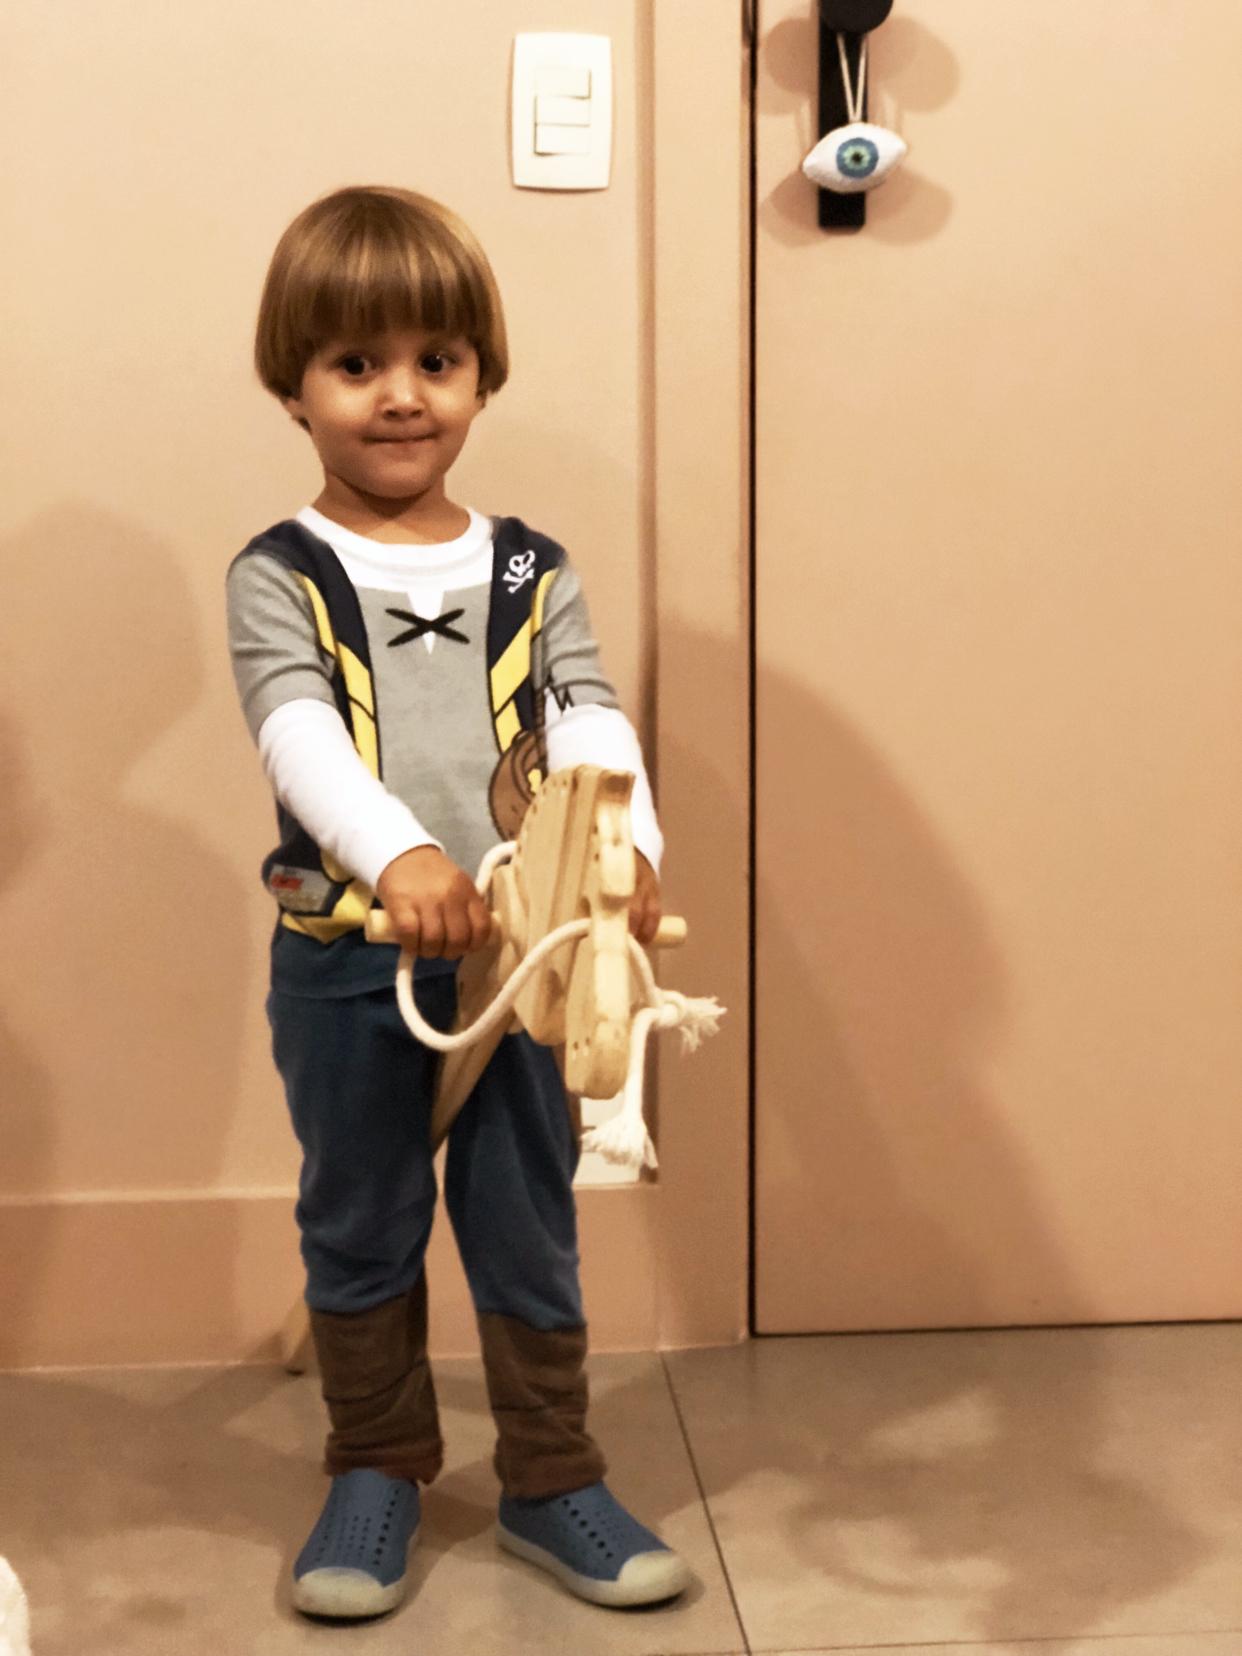 Lolla Bio Cavalo Madeira - Kids Gift Guide: O guia de presentes de Natal do Lolla para os pequenos